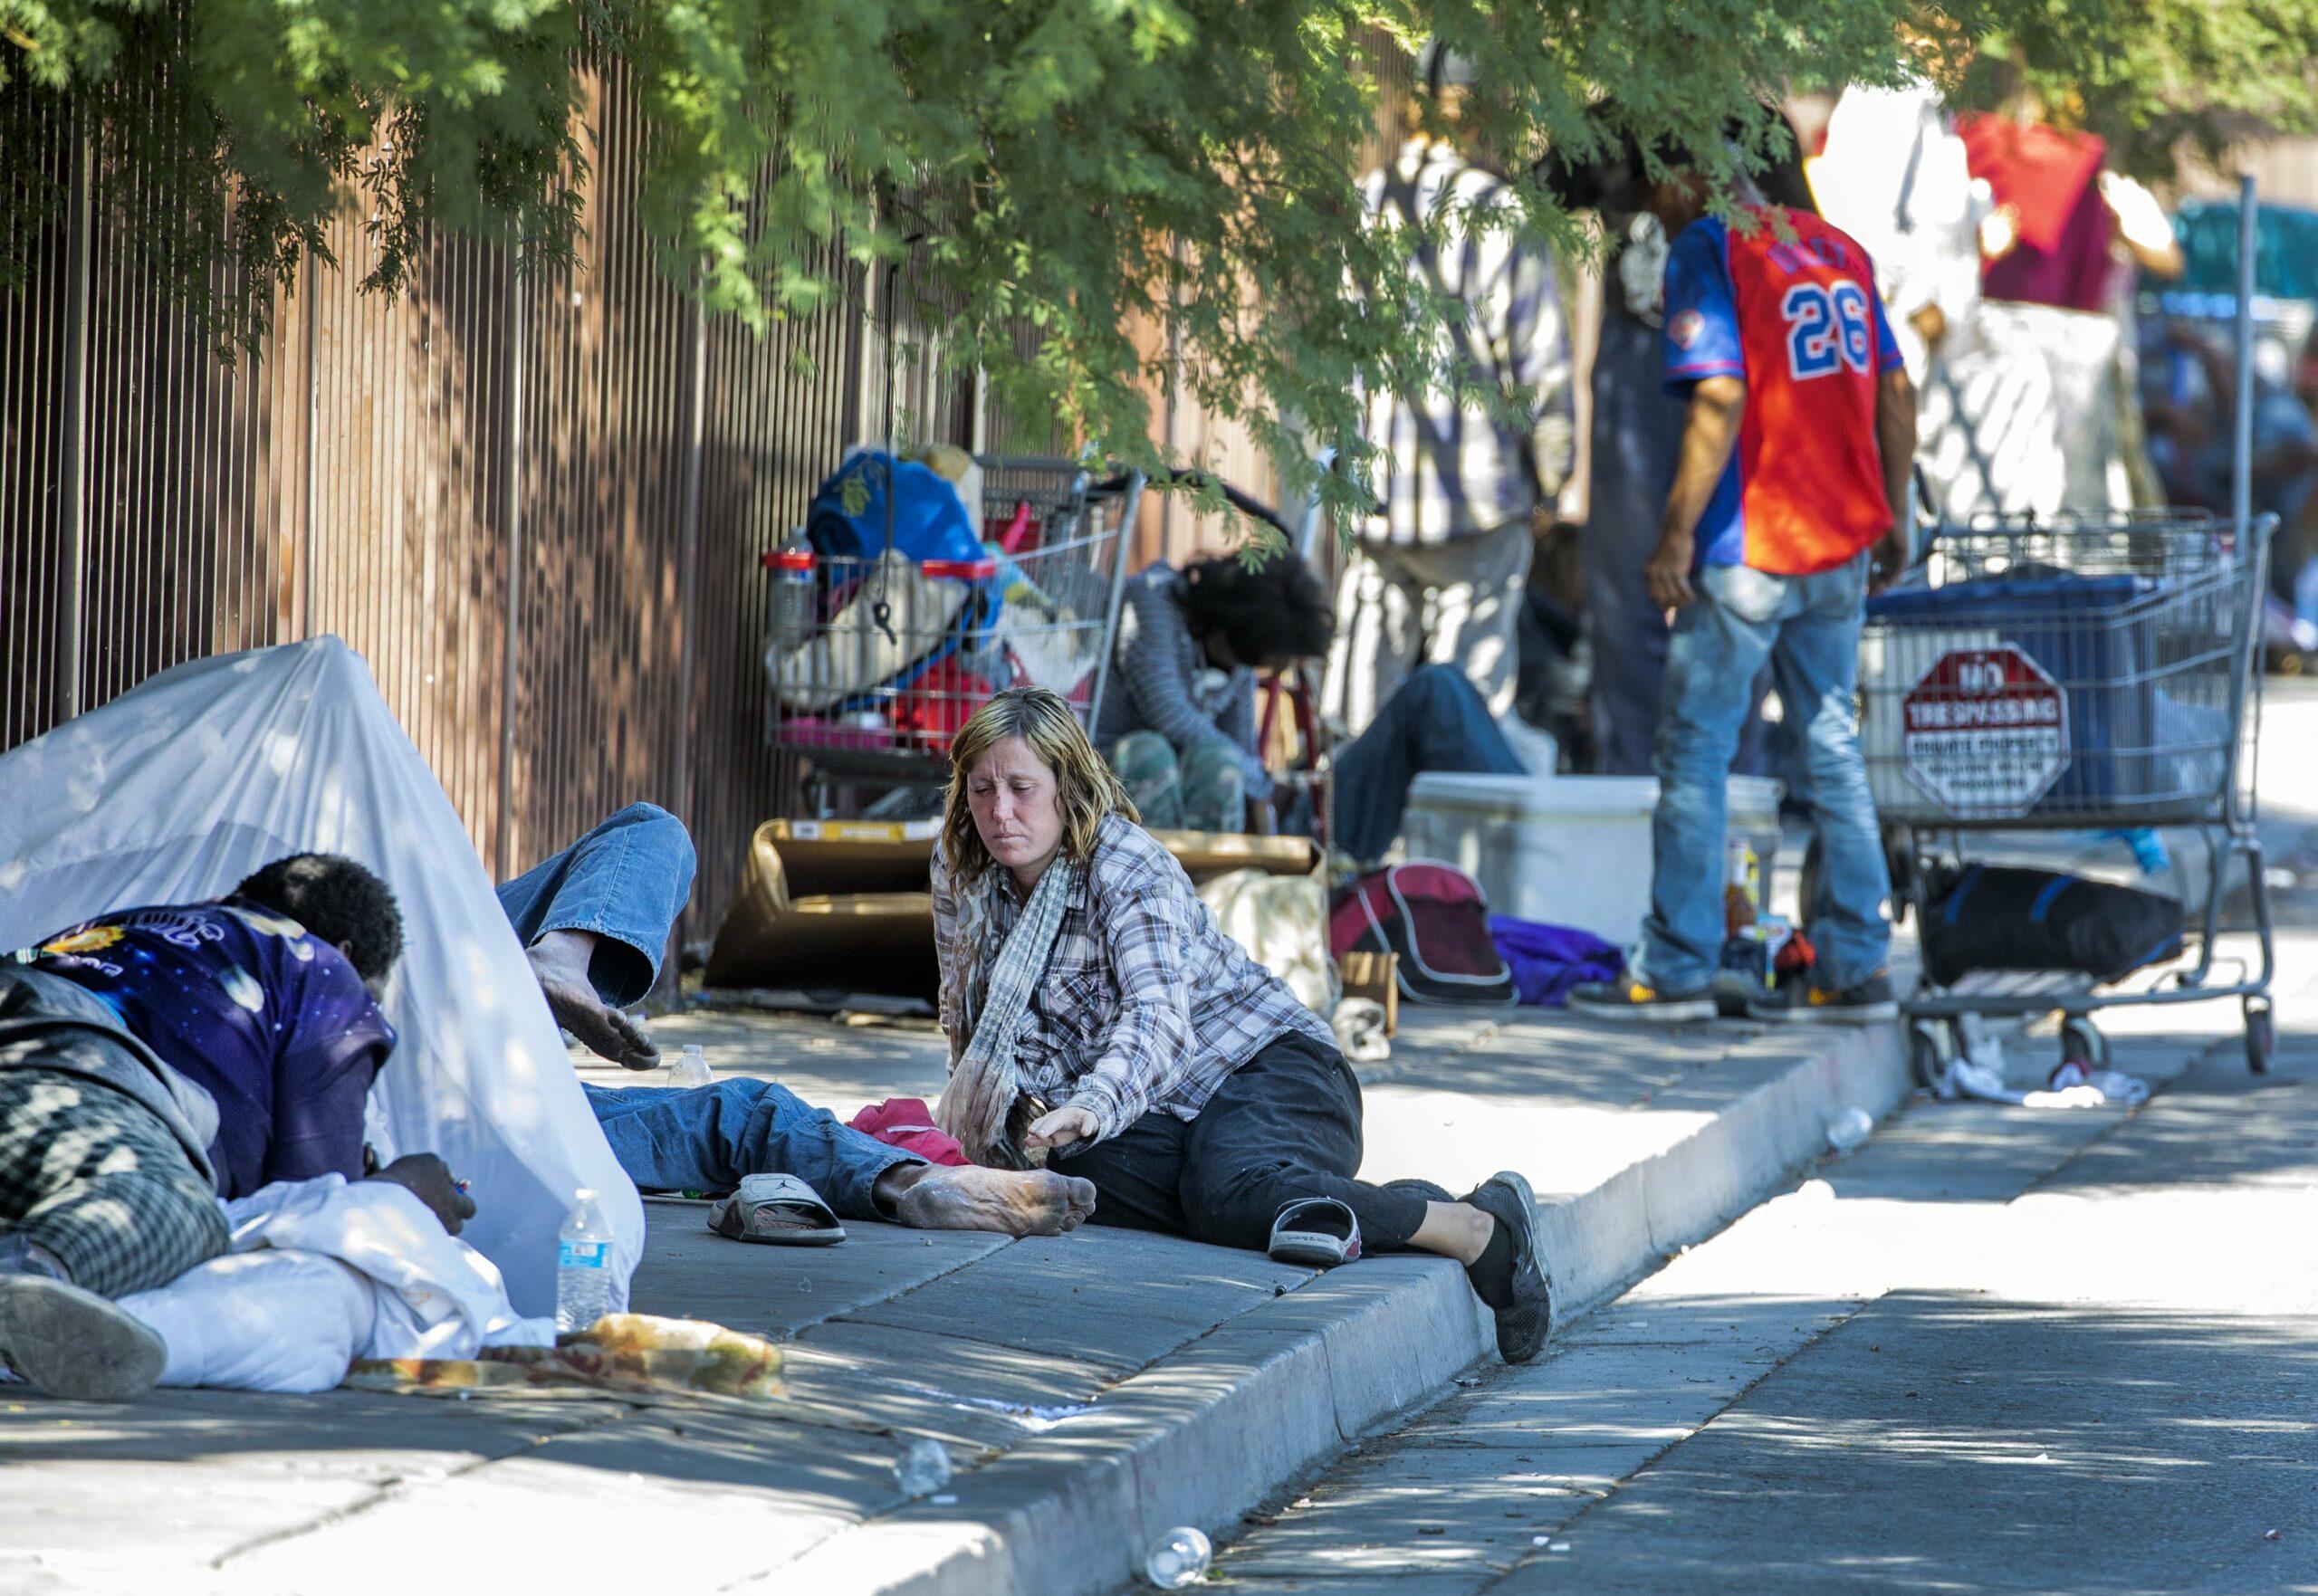 Homeless people on the sidewalk